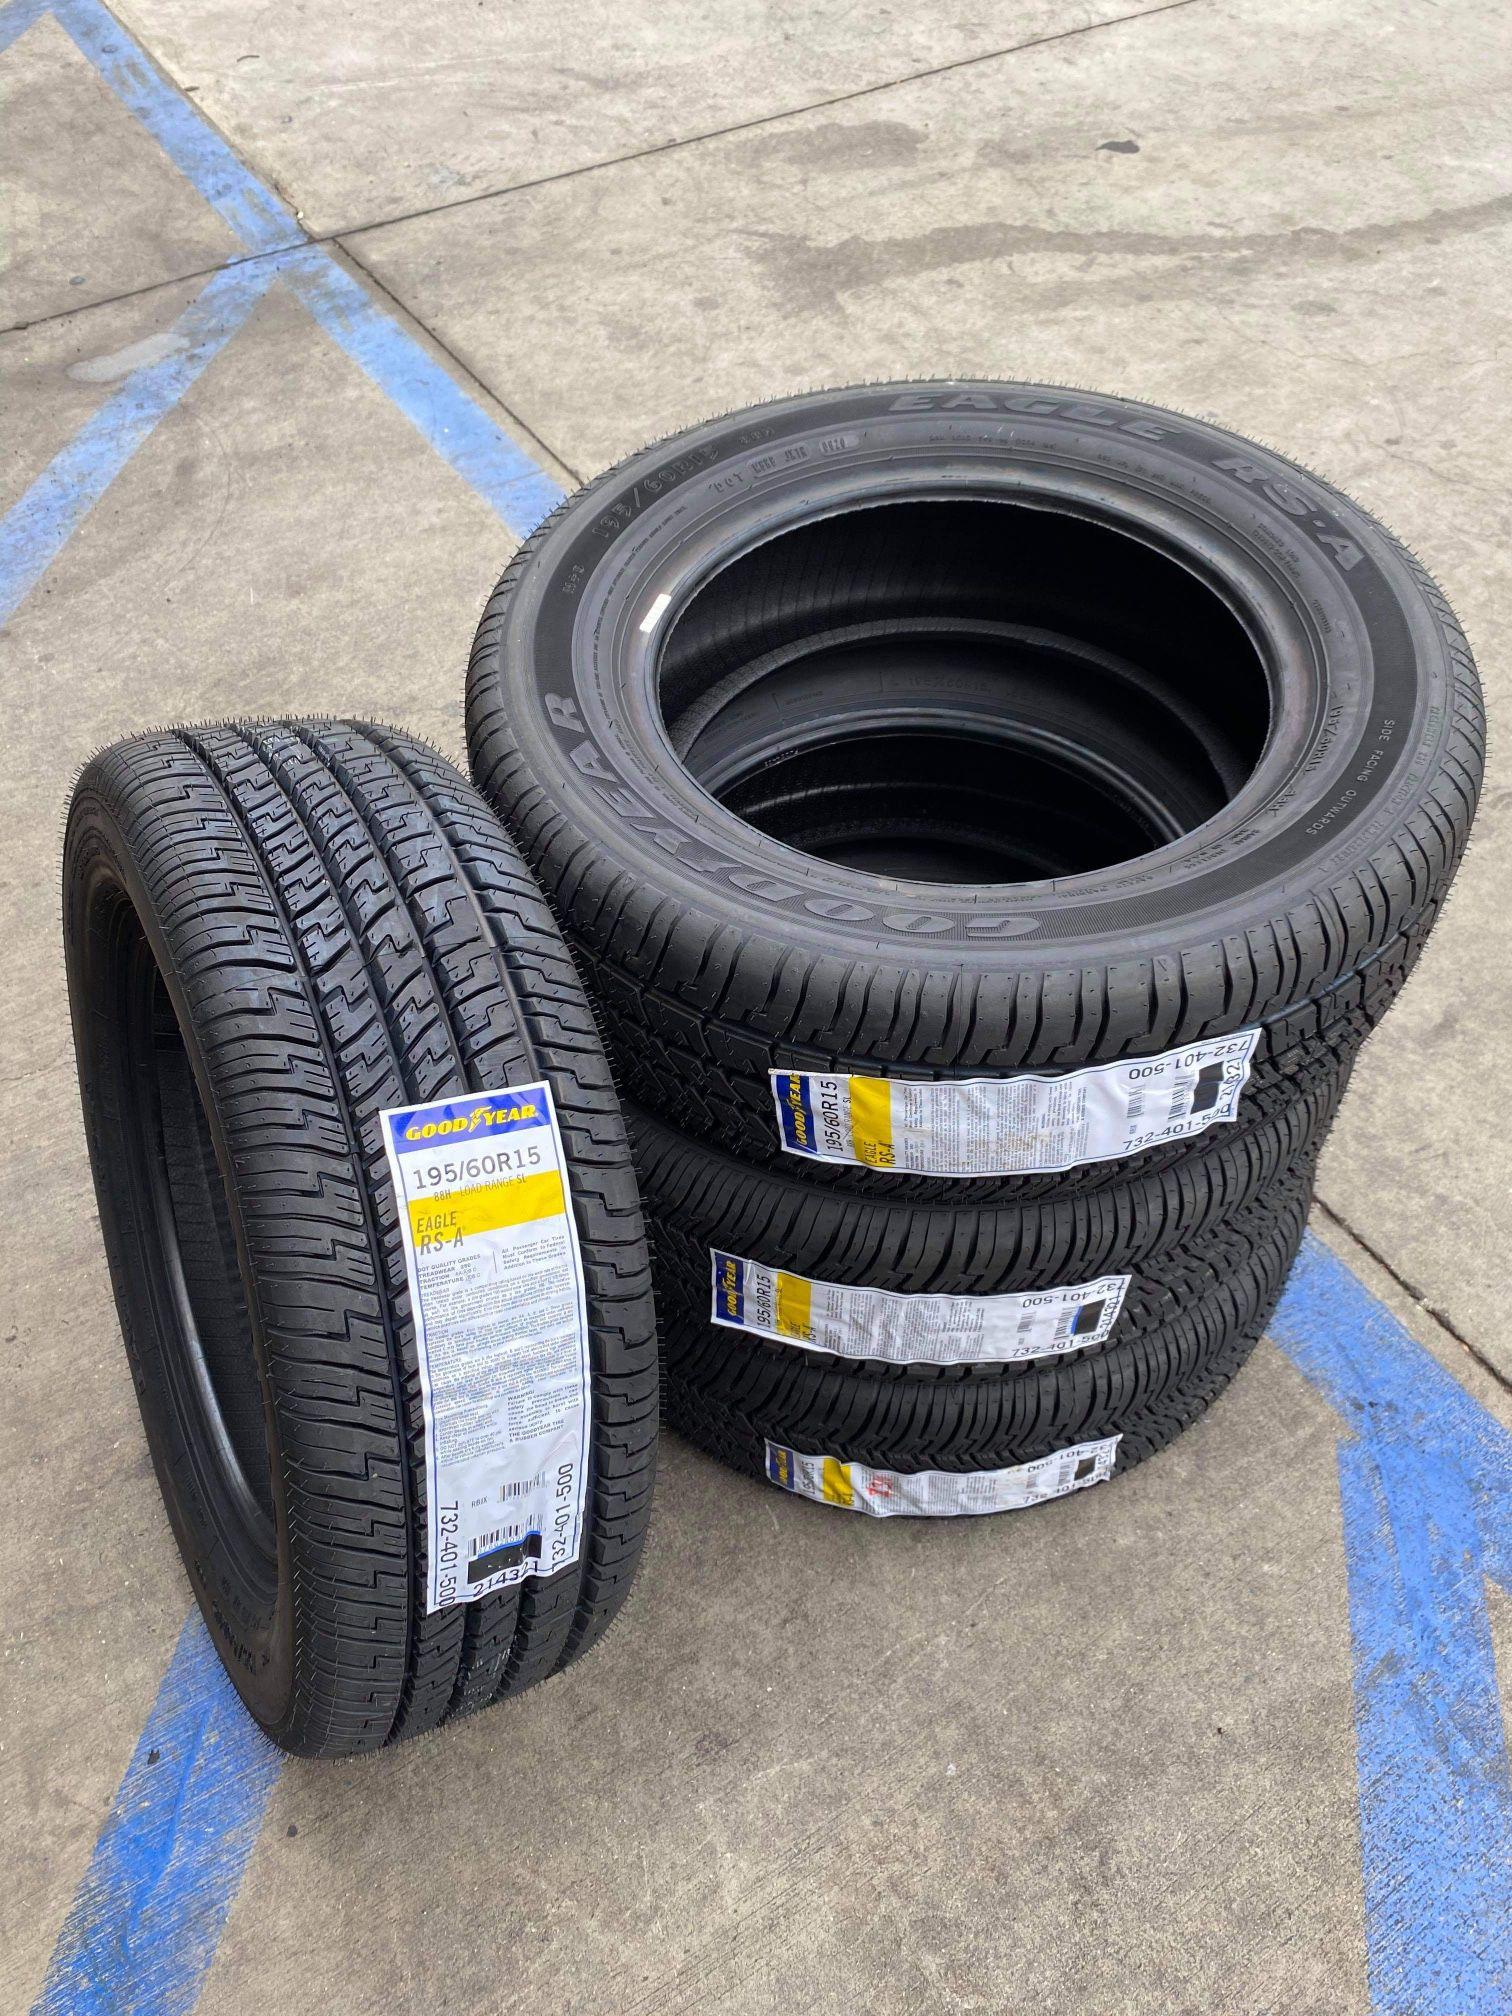 195/60/15 GOODYEAR Egle New Tires